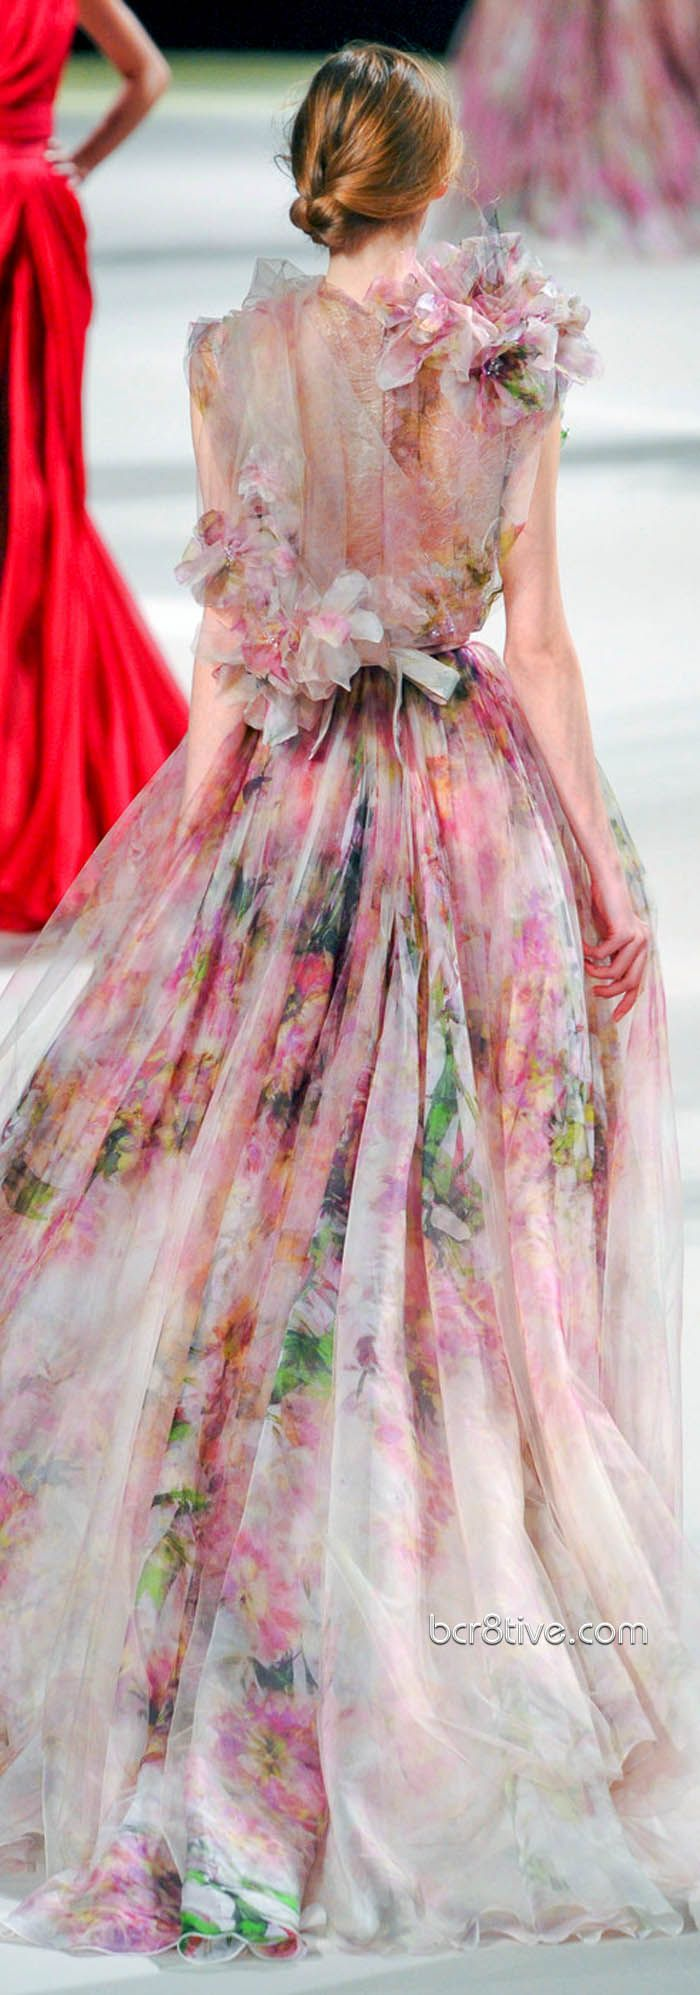 Elie Saab - Haute Couture | Saab couture | Pinterest